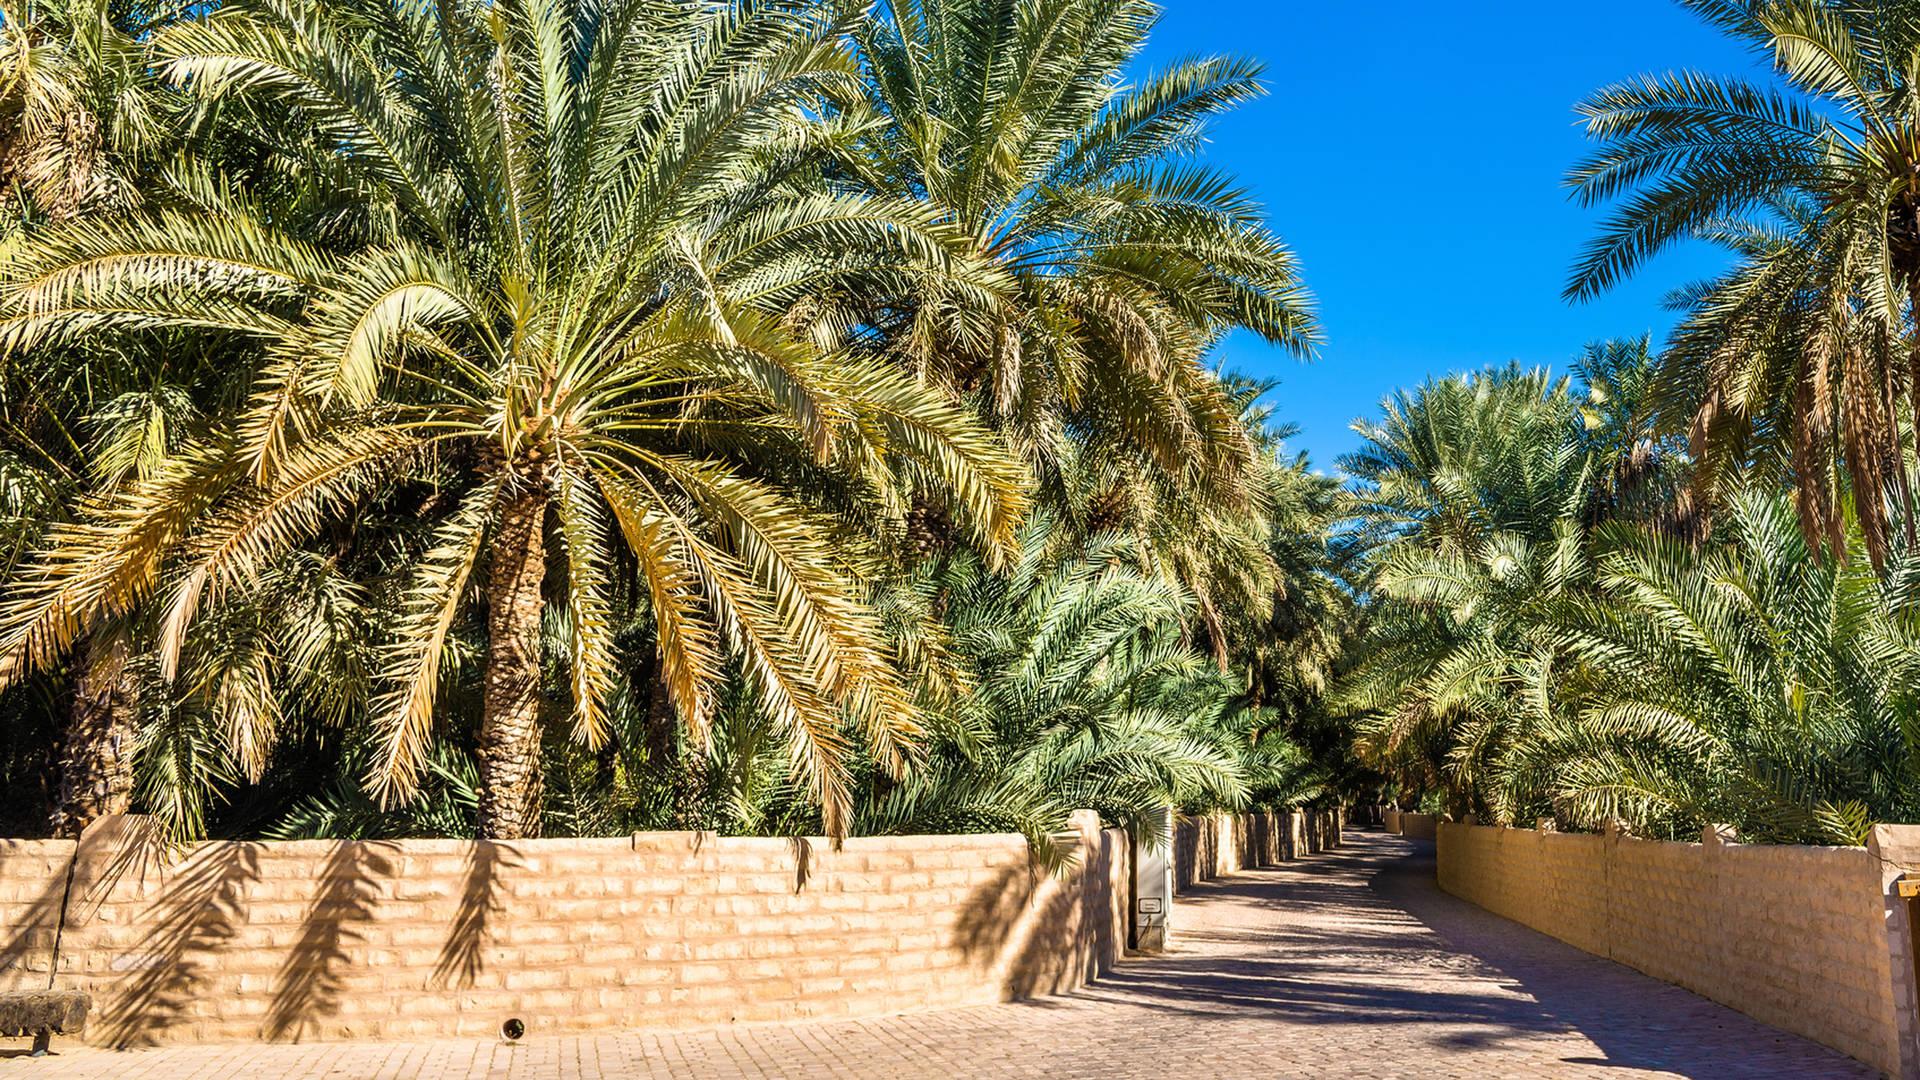 Al Ain oasis pathways